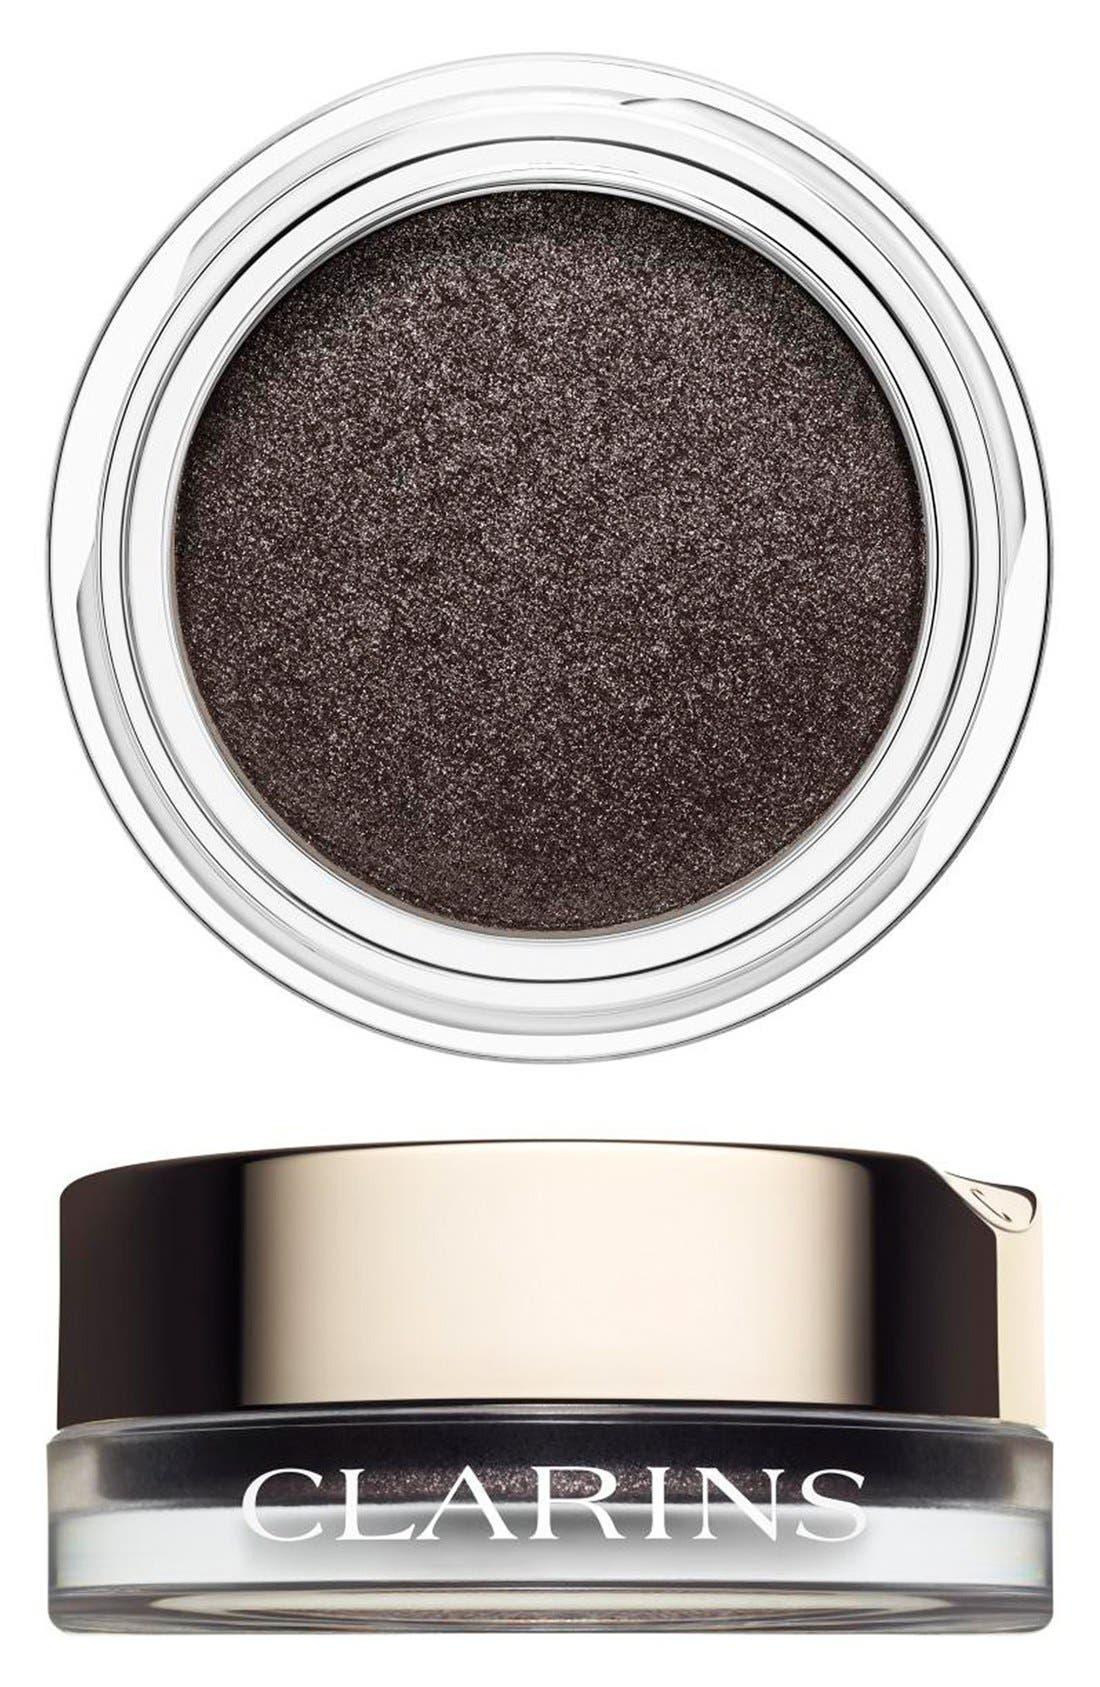 Ombré Matte Cream-to-Powder Matte Eyeshadow,                         Main,                         color, 05 SPARKLE GREY